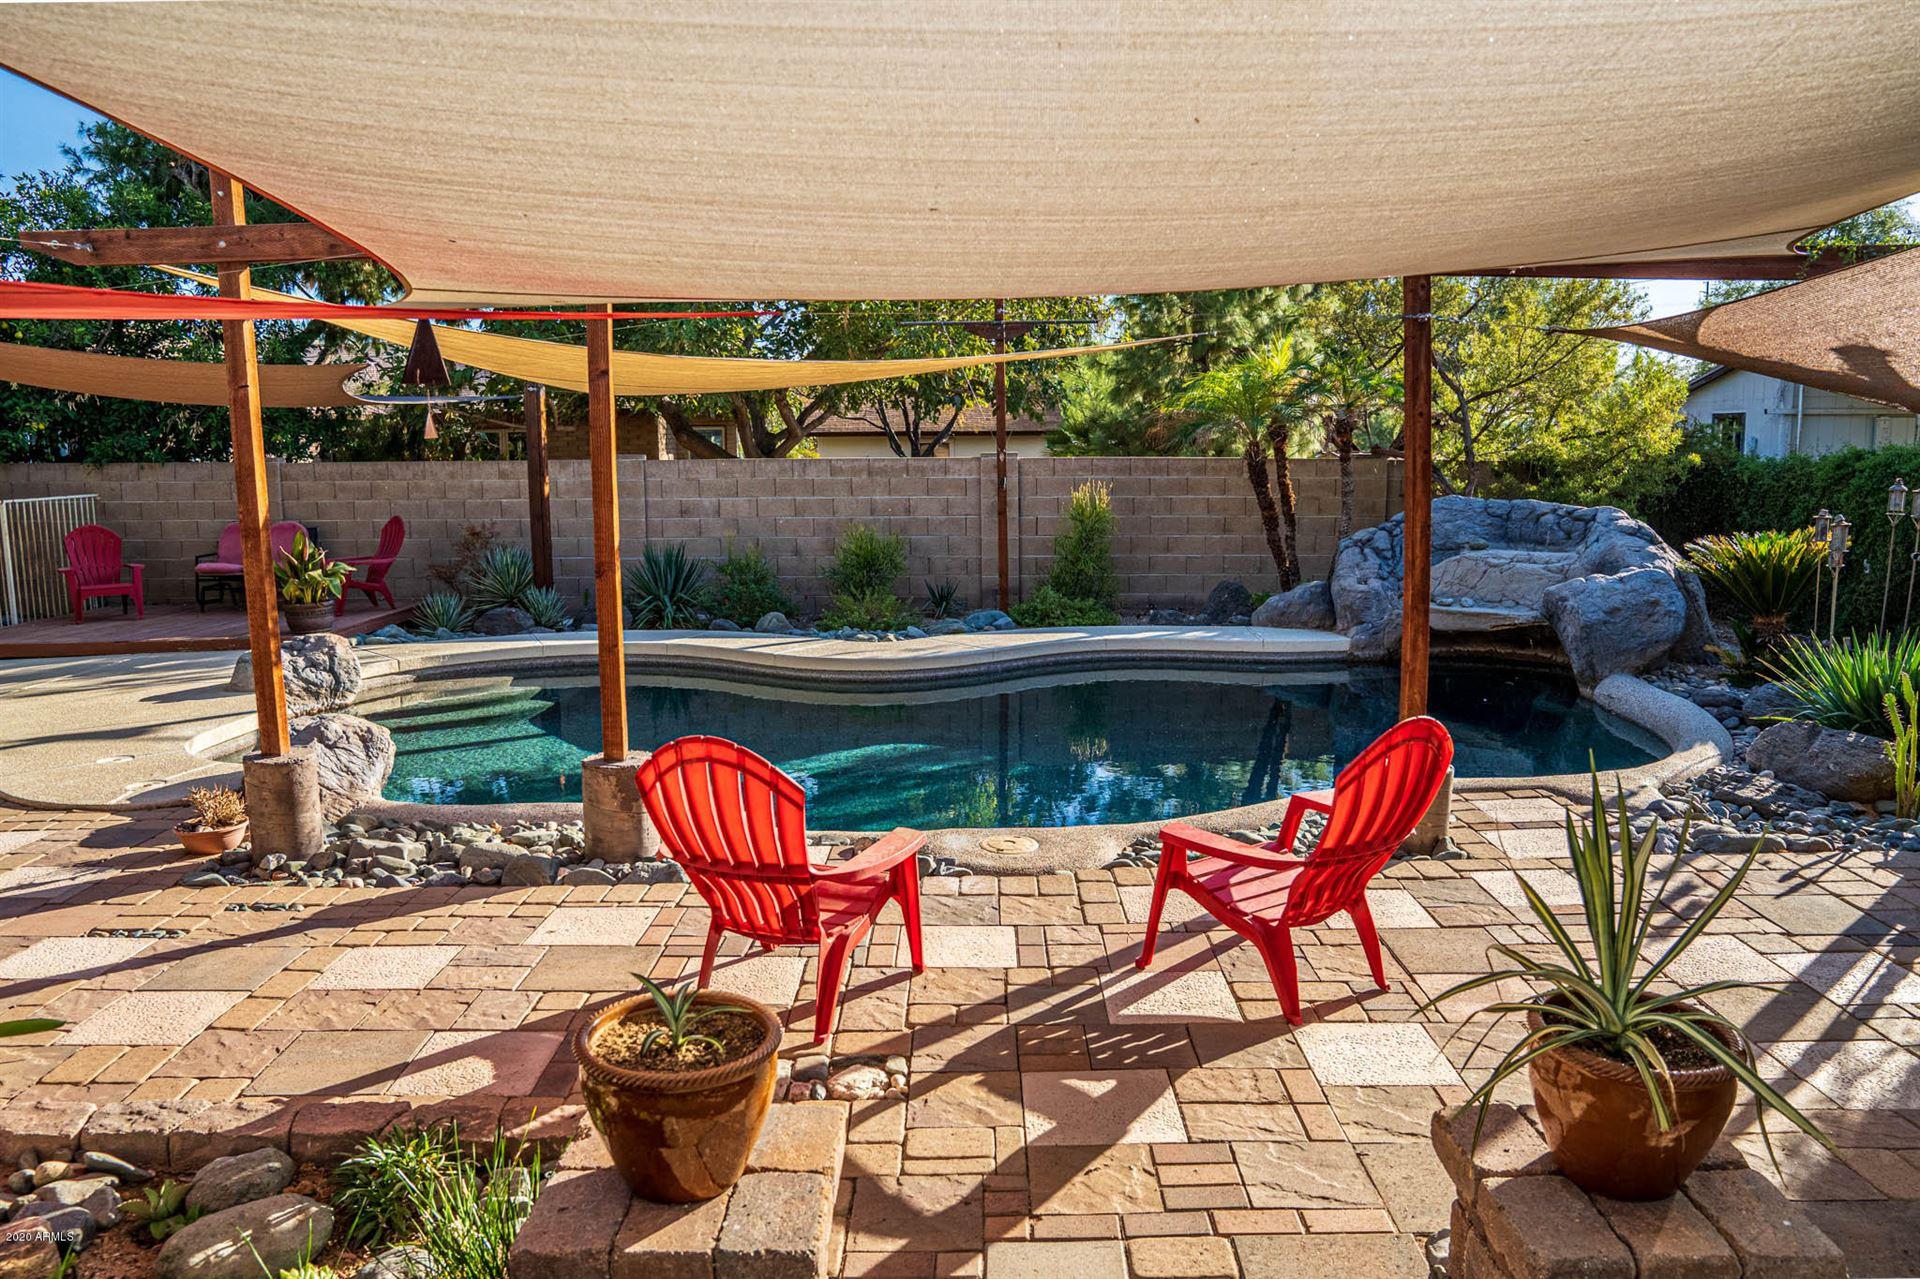 18824 N 30TH Street, Phoenix, AZ 85050 - MLS#: 6163105